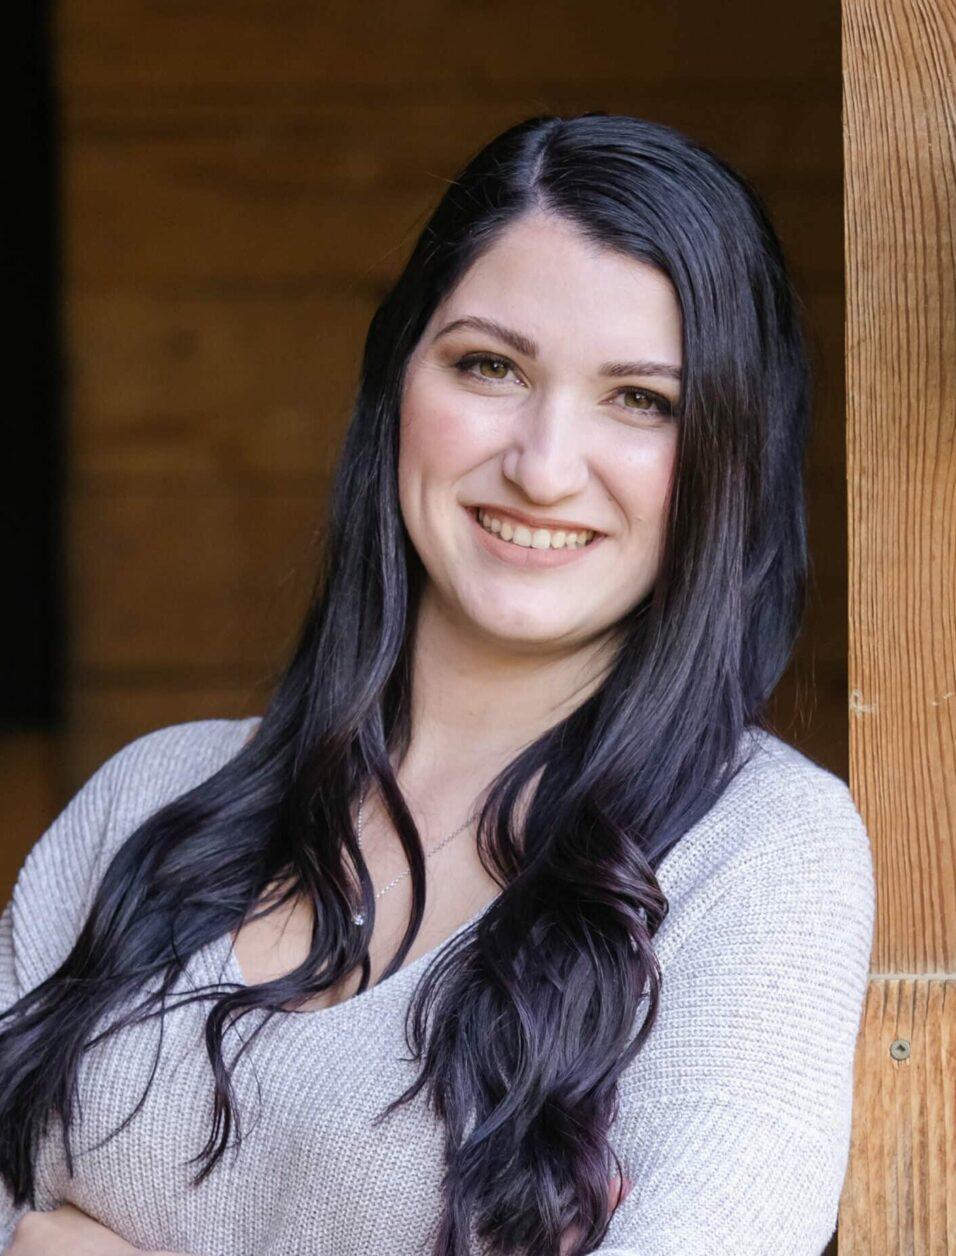 Cassandra Frink, Student